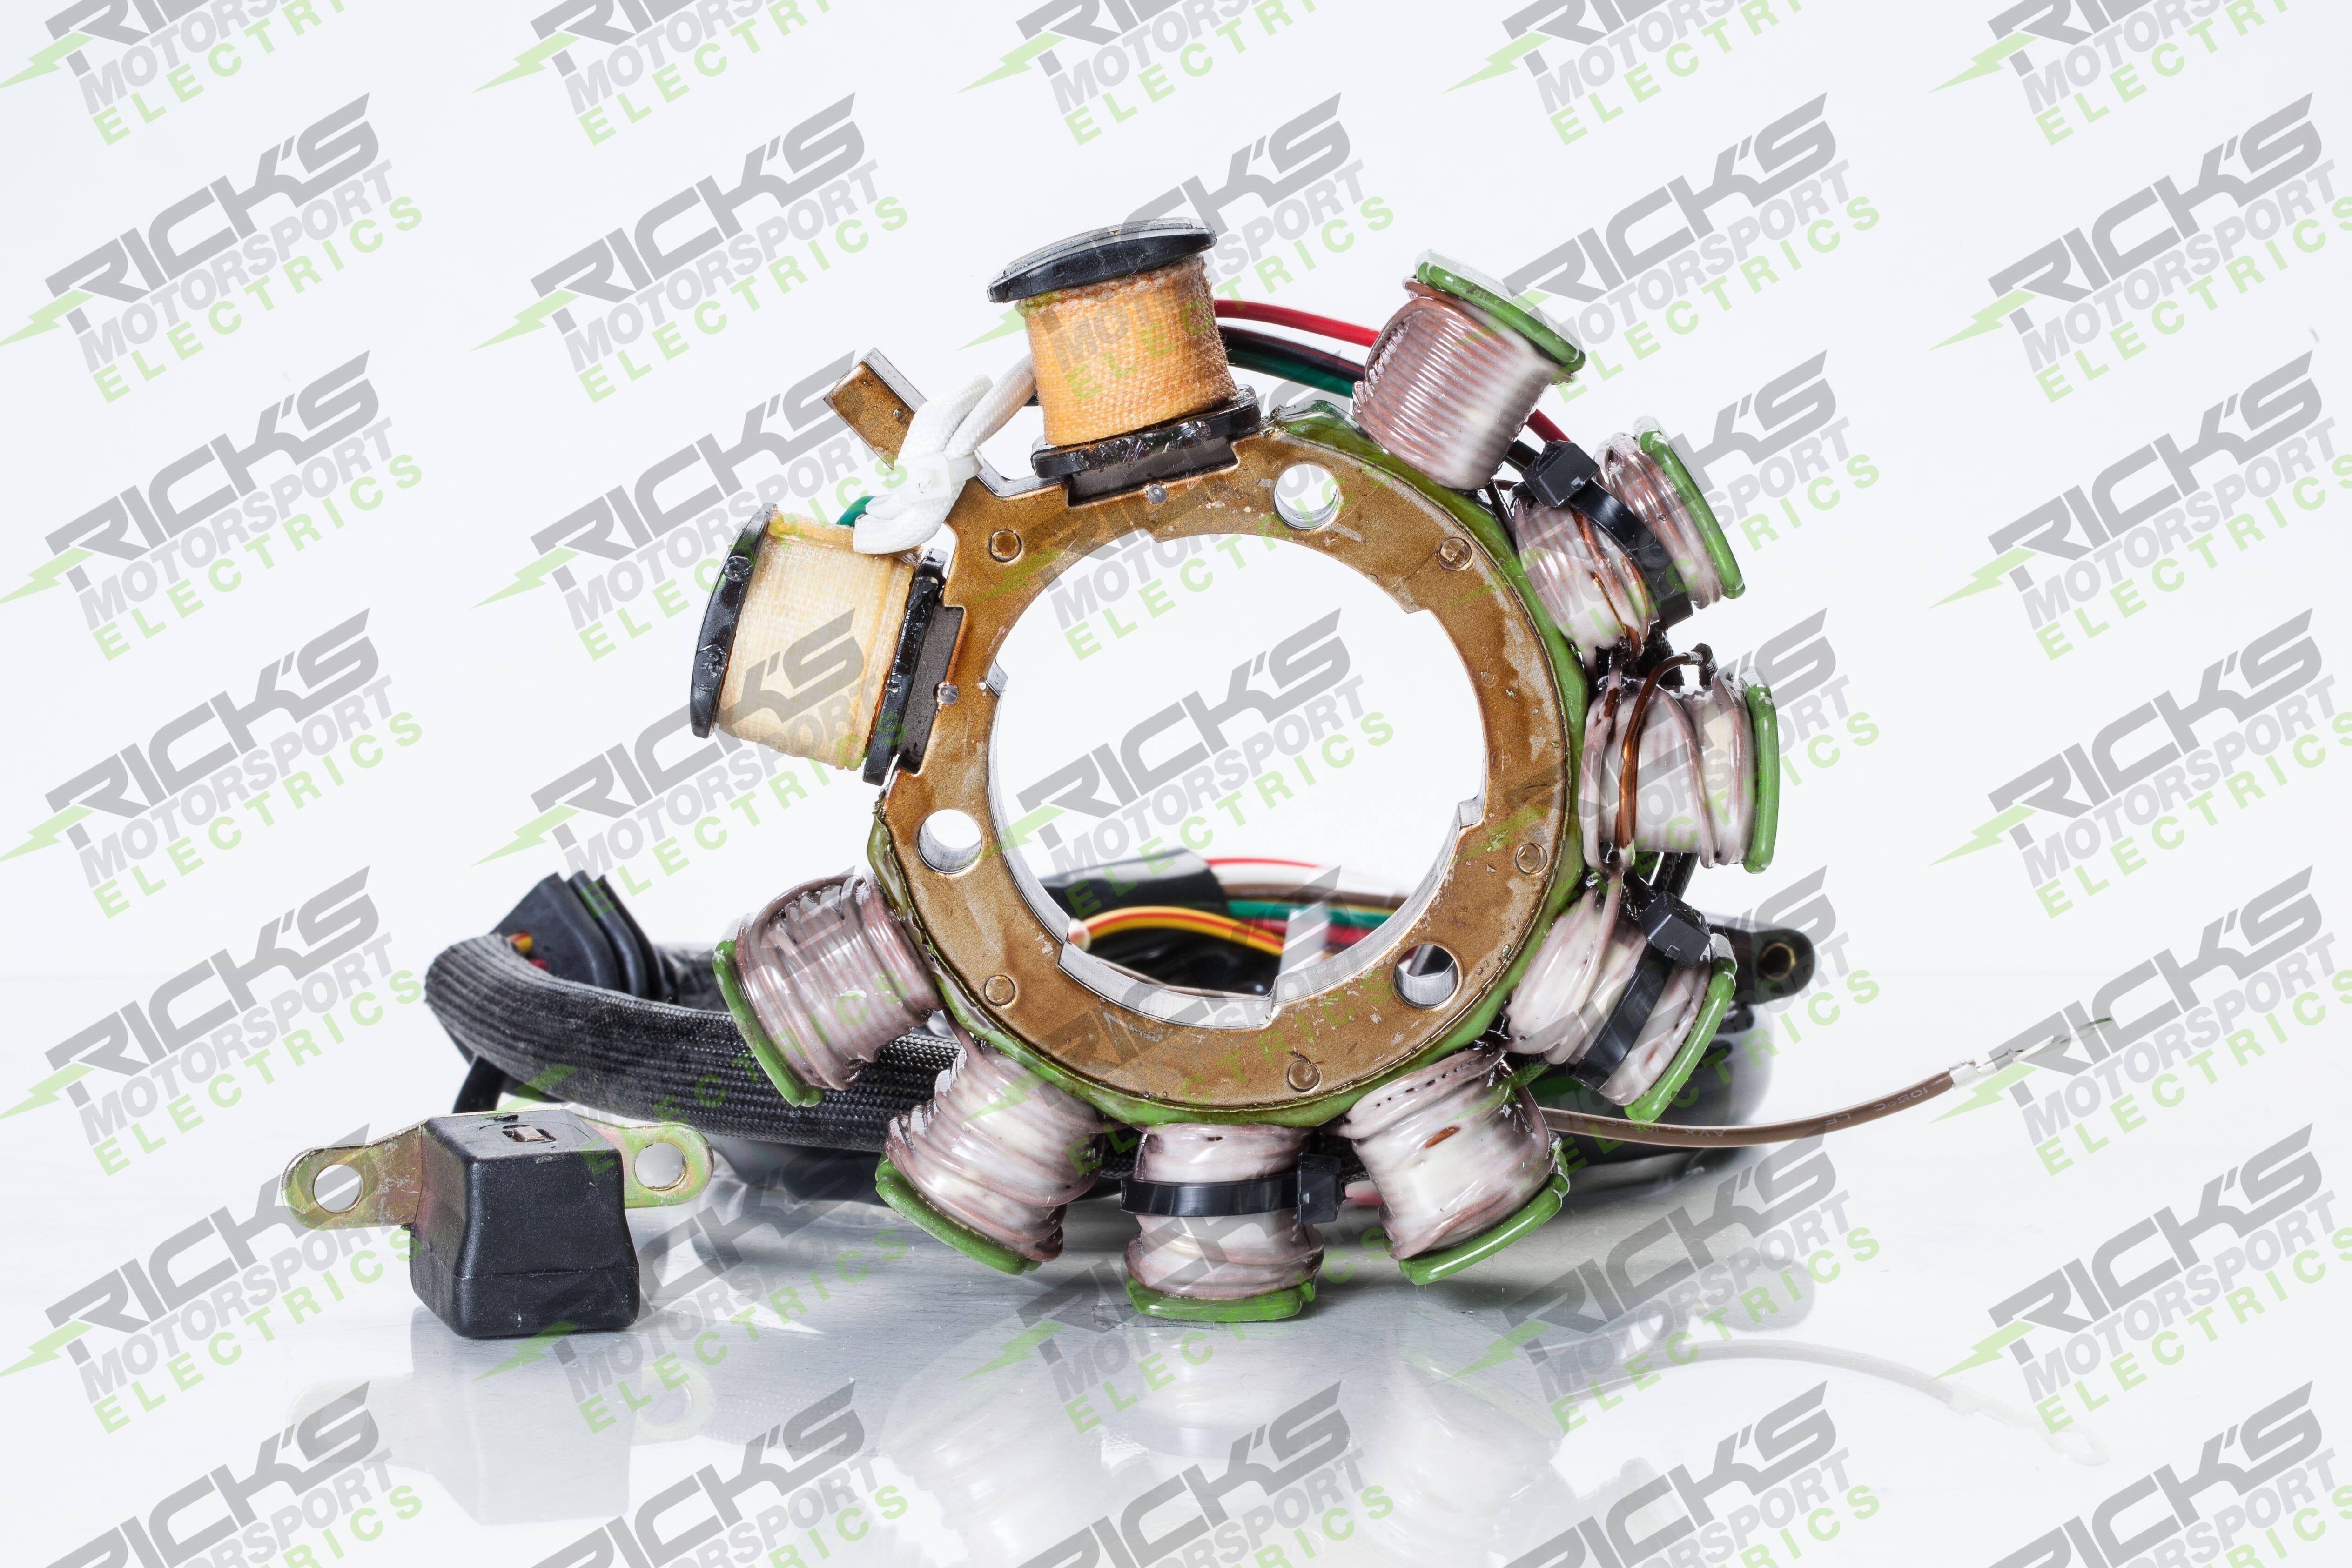 New OEM Style Polaris Stator 21_551